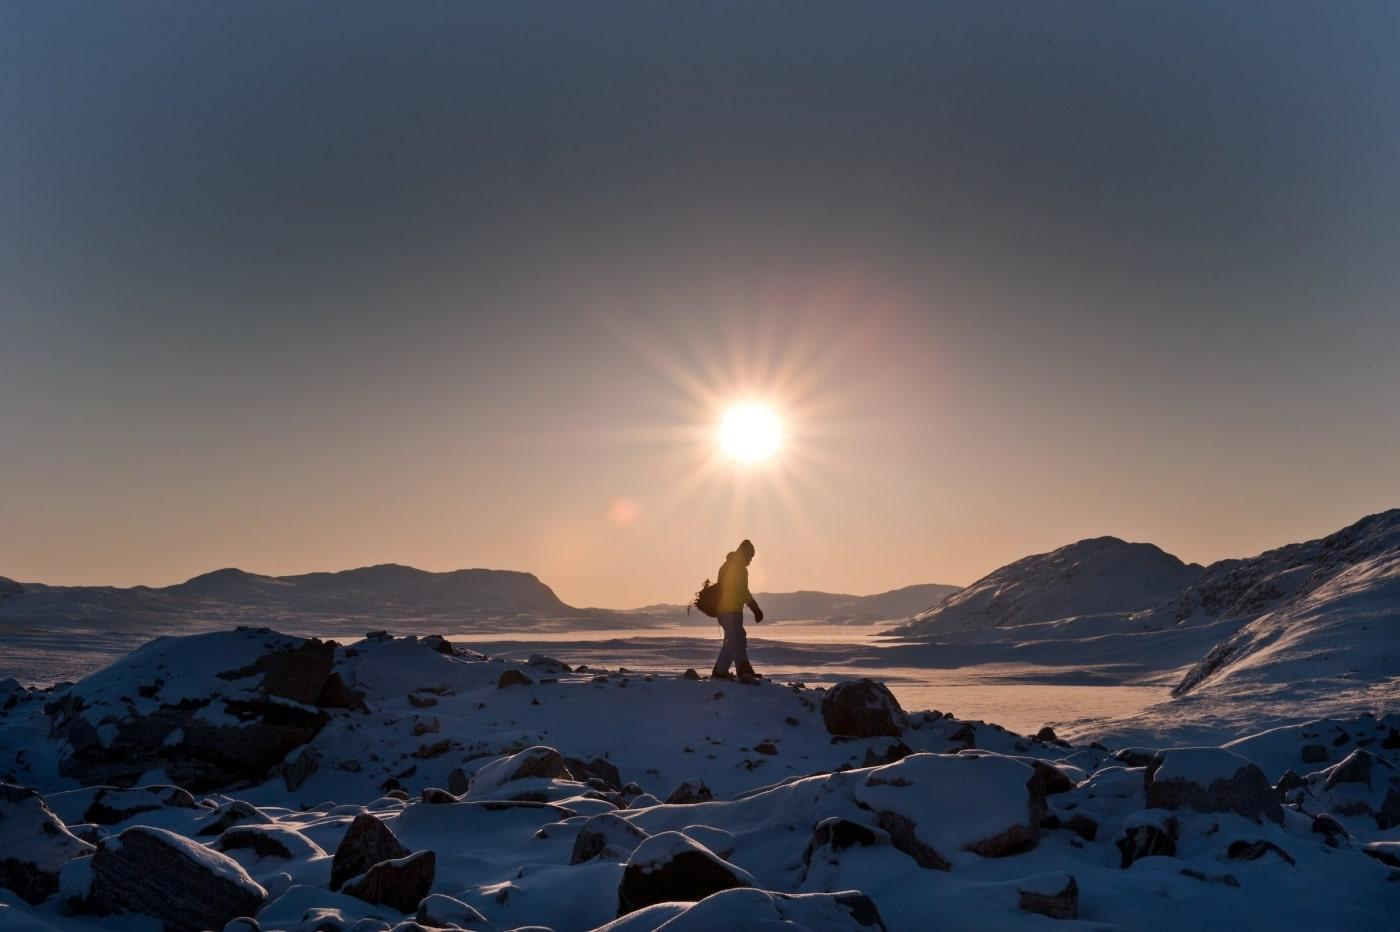 Hiking near Kangerlussuaq. Photo by Humbert Entress - Visit Greenland